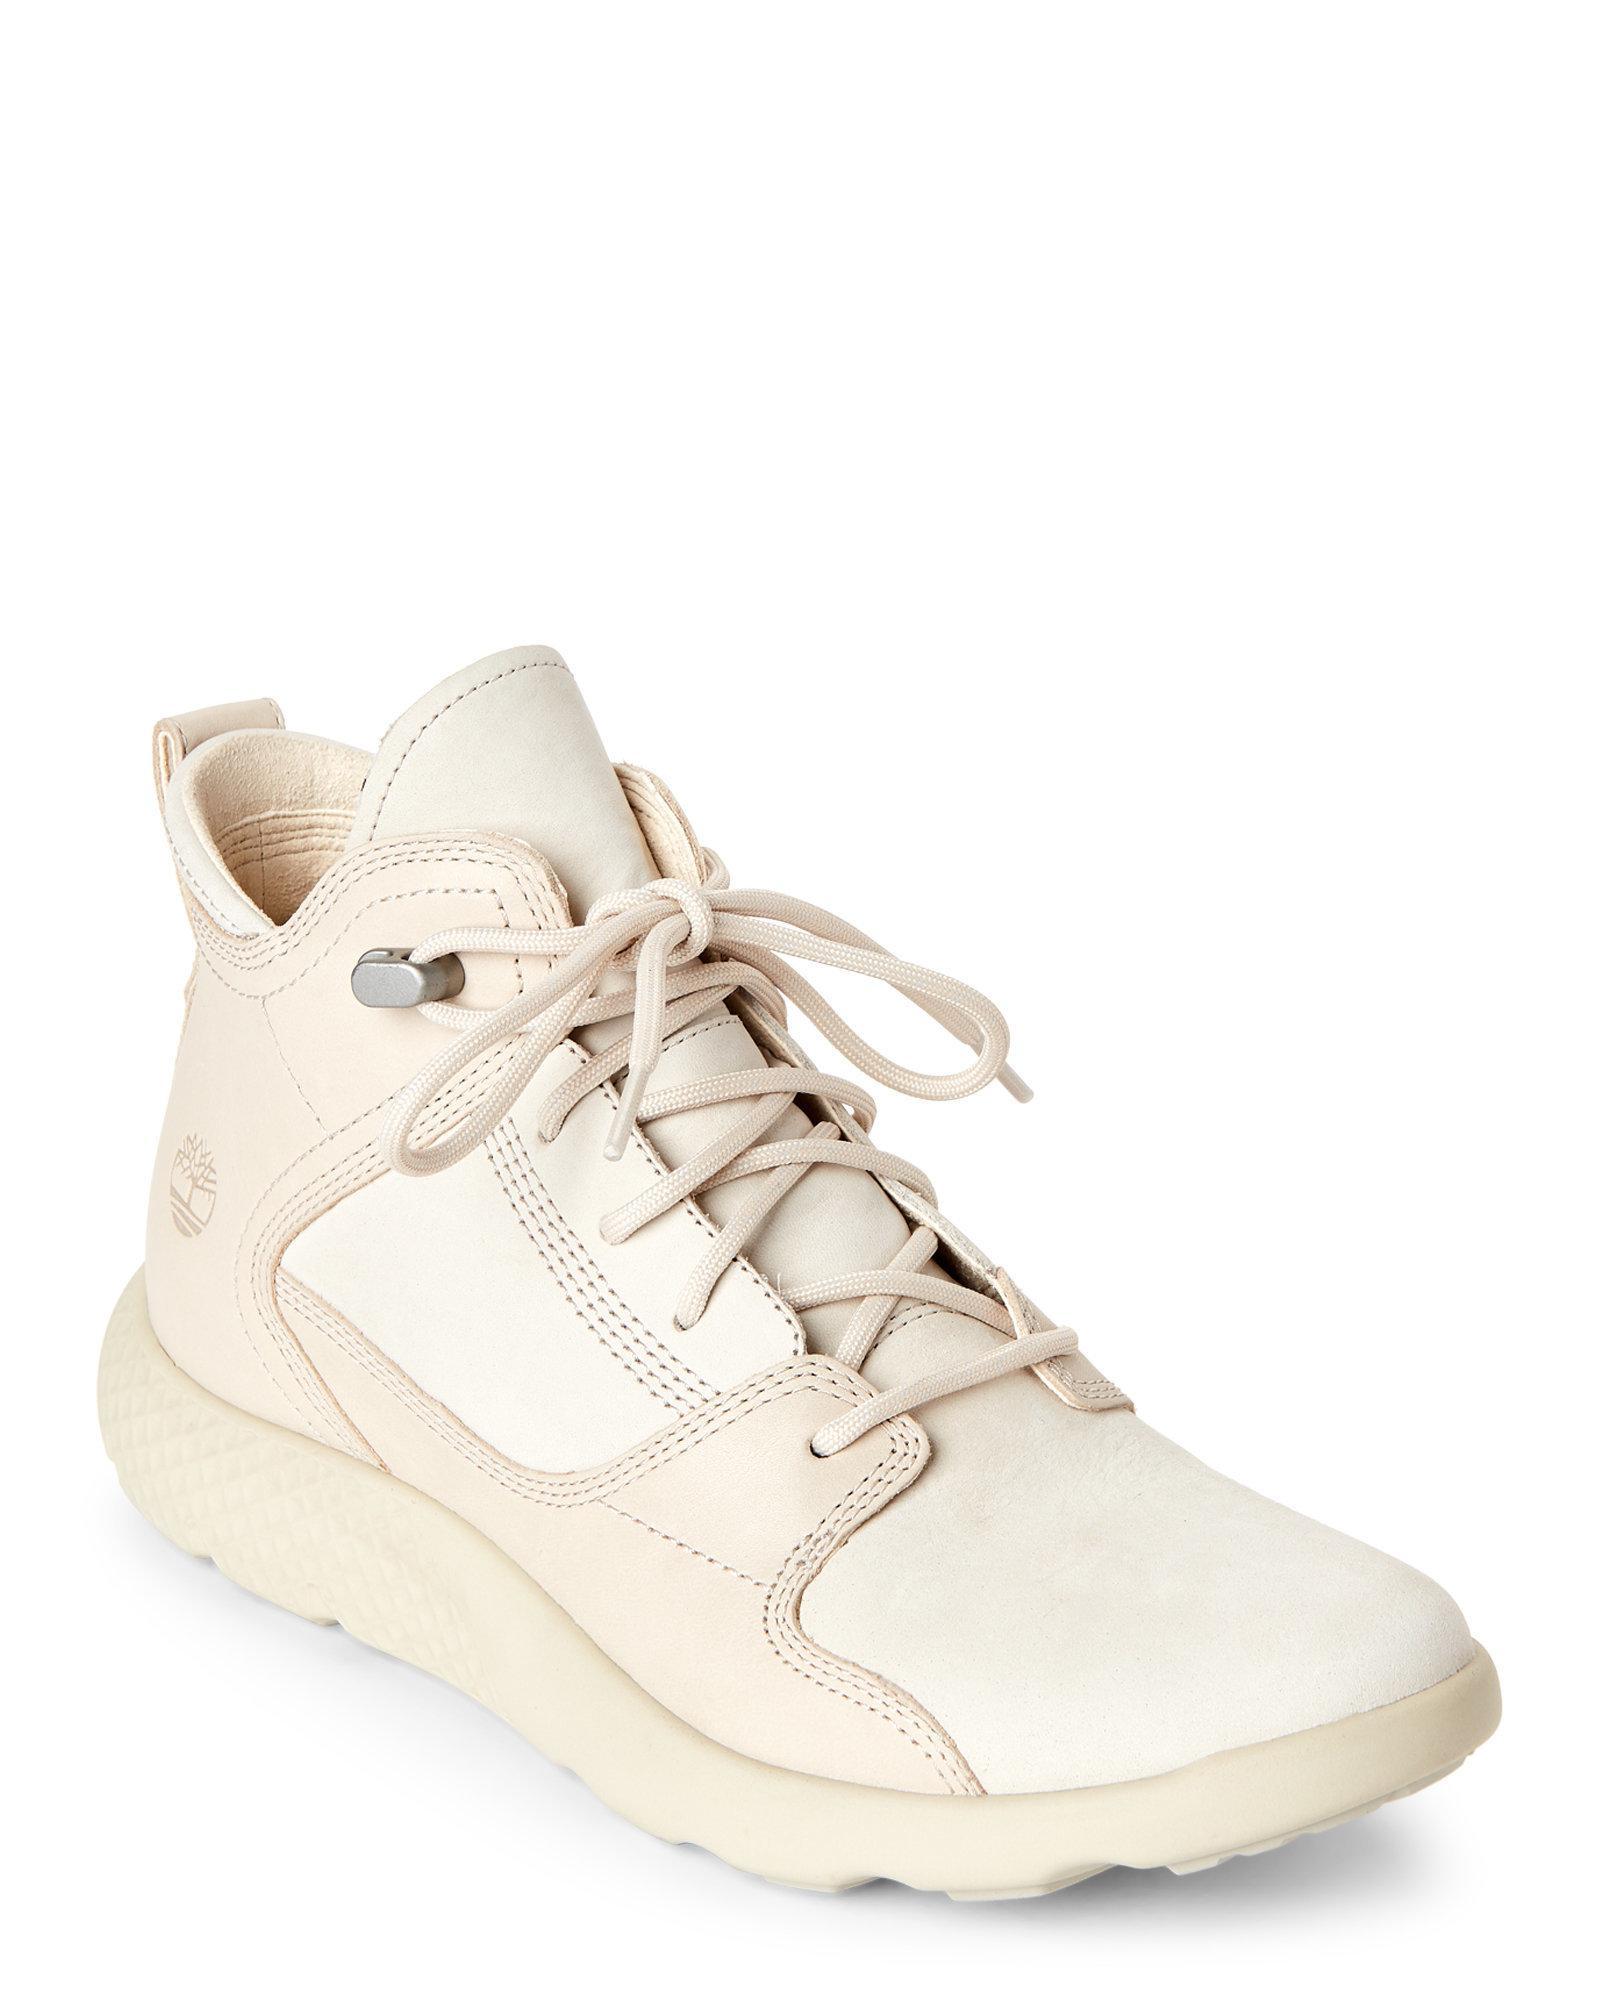 ef65fbfa48f1 Lyst - Timberland Rainy Day Flyroam Hiker High-top Sneakers